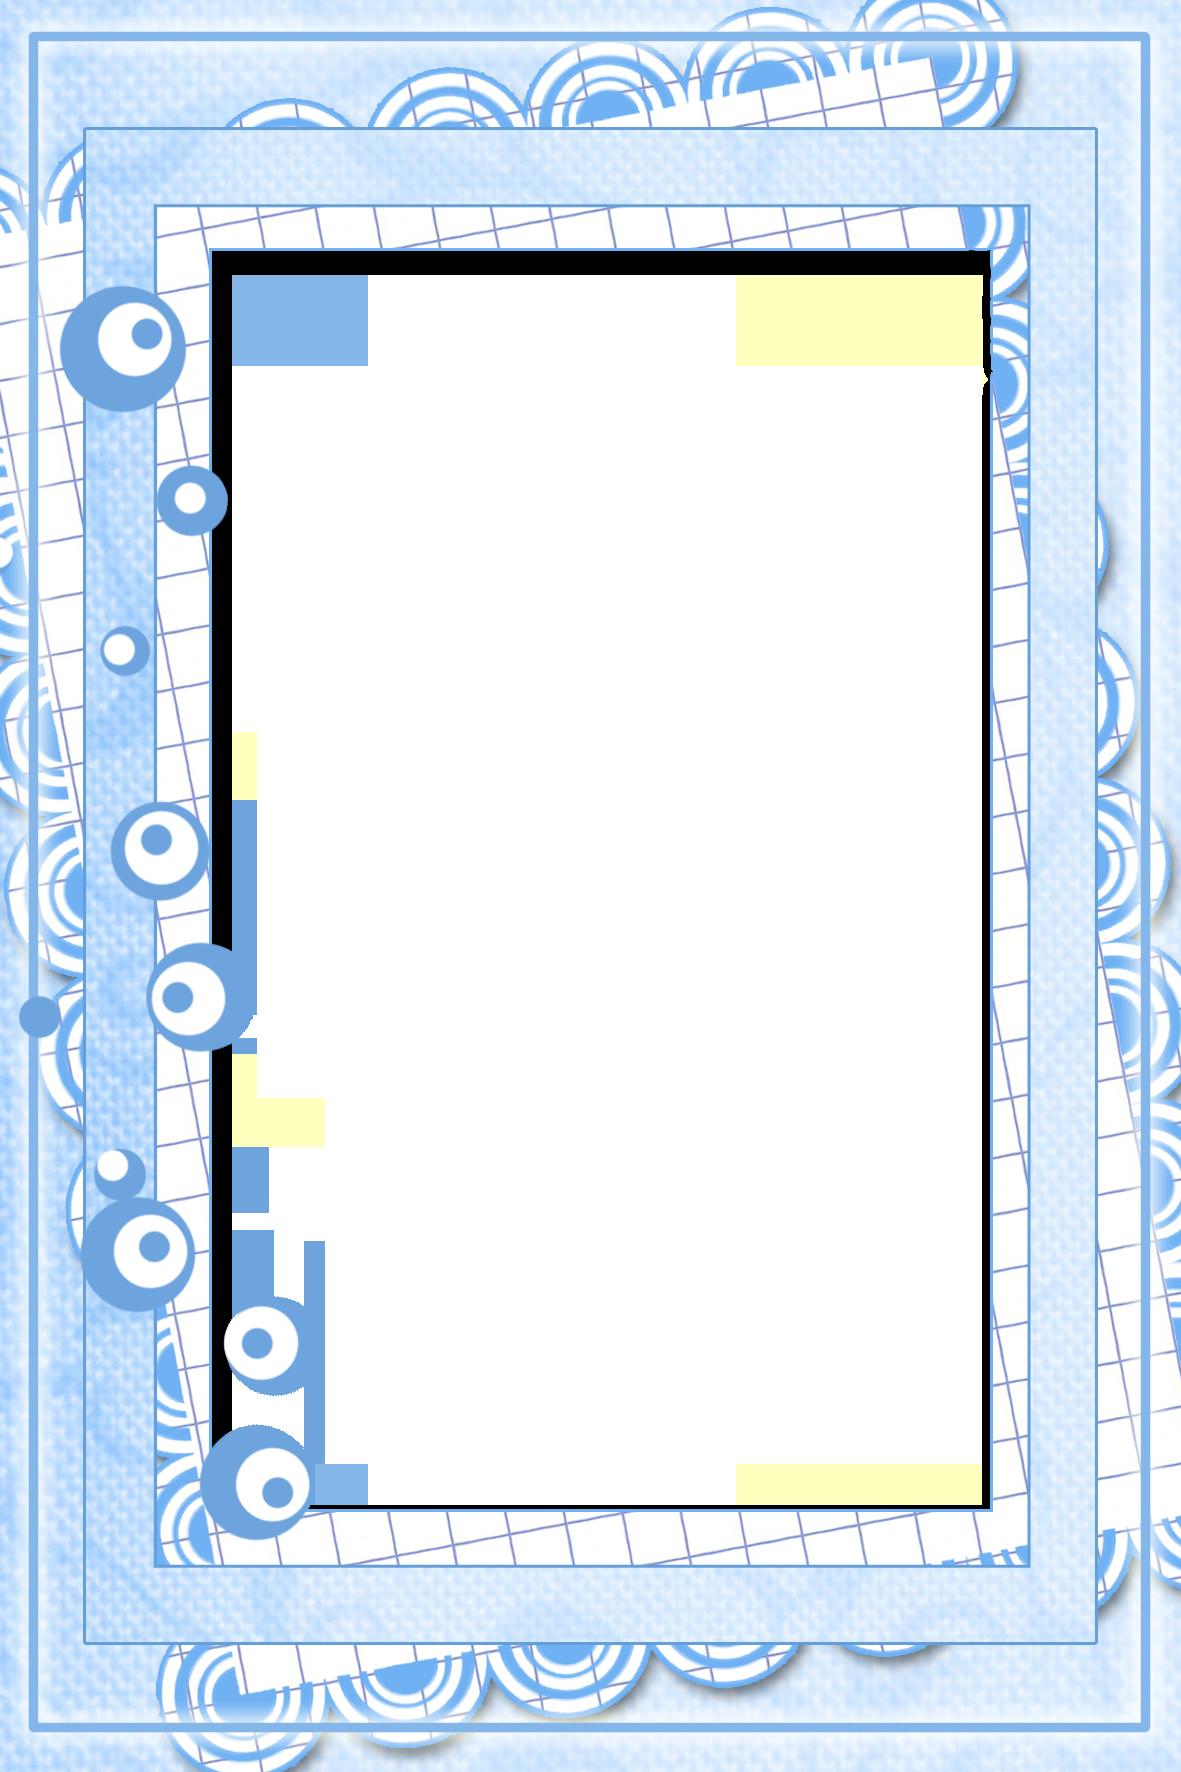 C:\Users\Дариша\Desktop\для работы\рамка.png